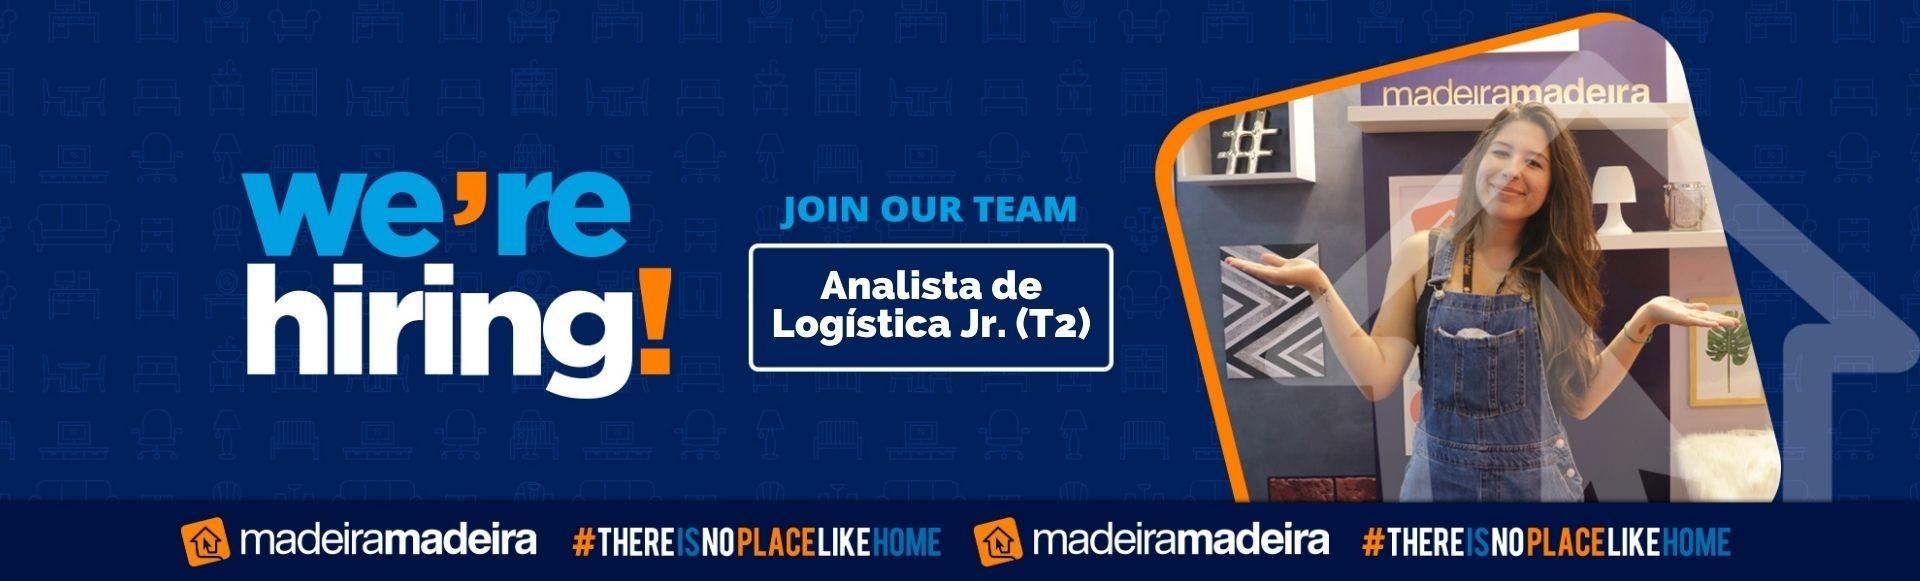 Analista de Logística Jr. (T2)